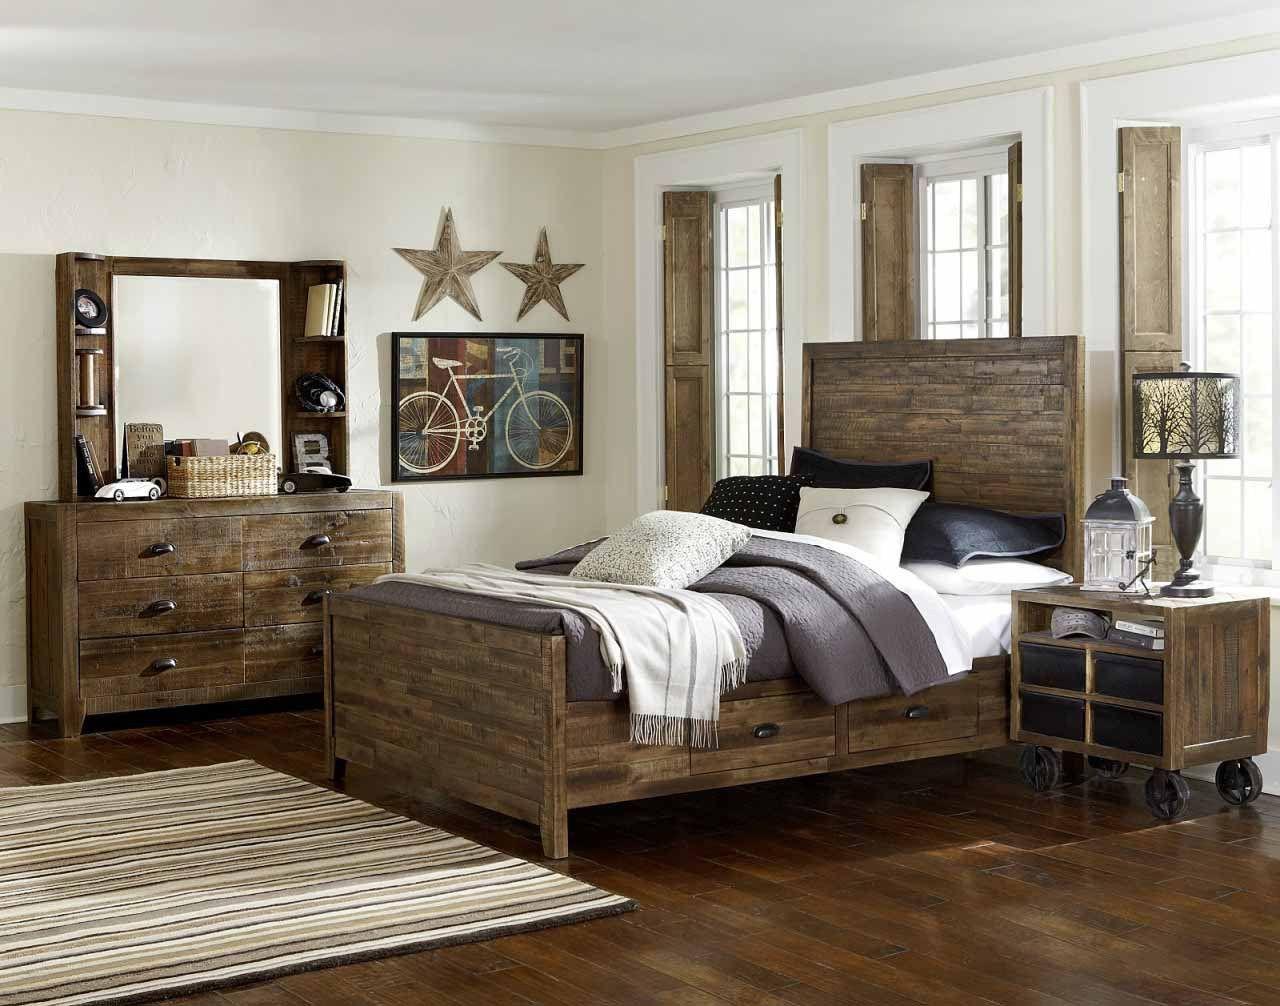 Gentil The Country Taste Of Distressed Wood Bedroom Furniture